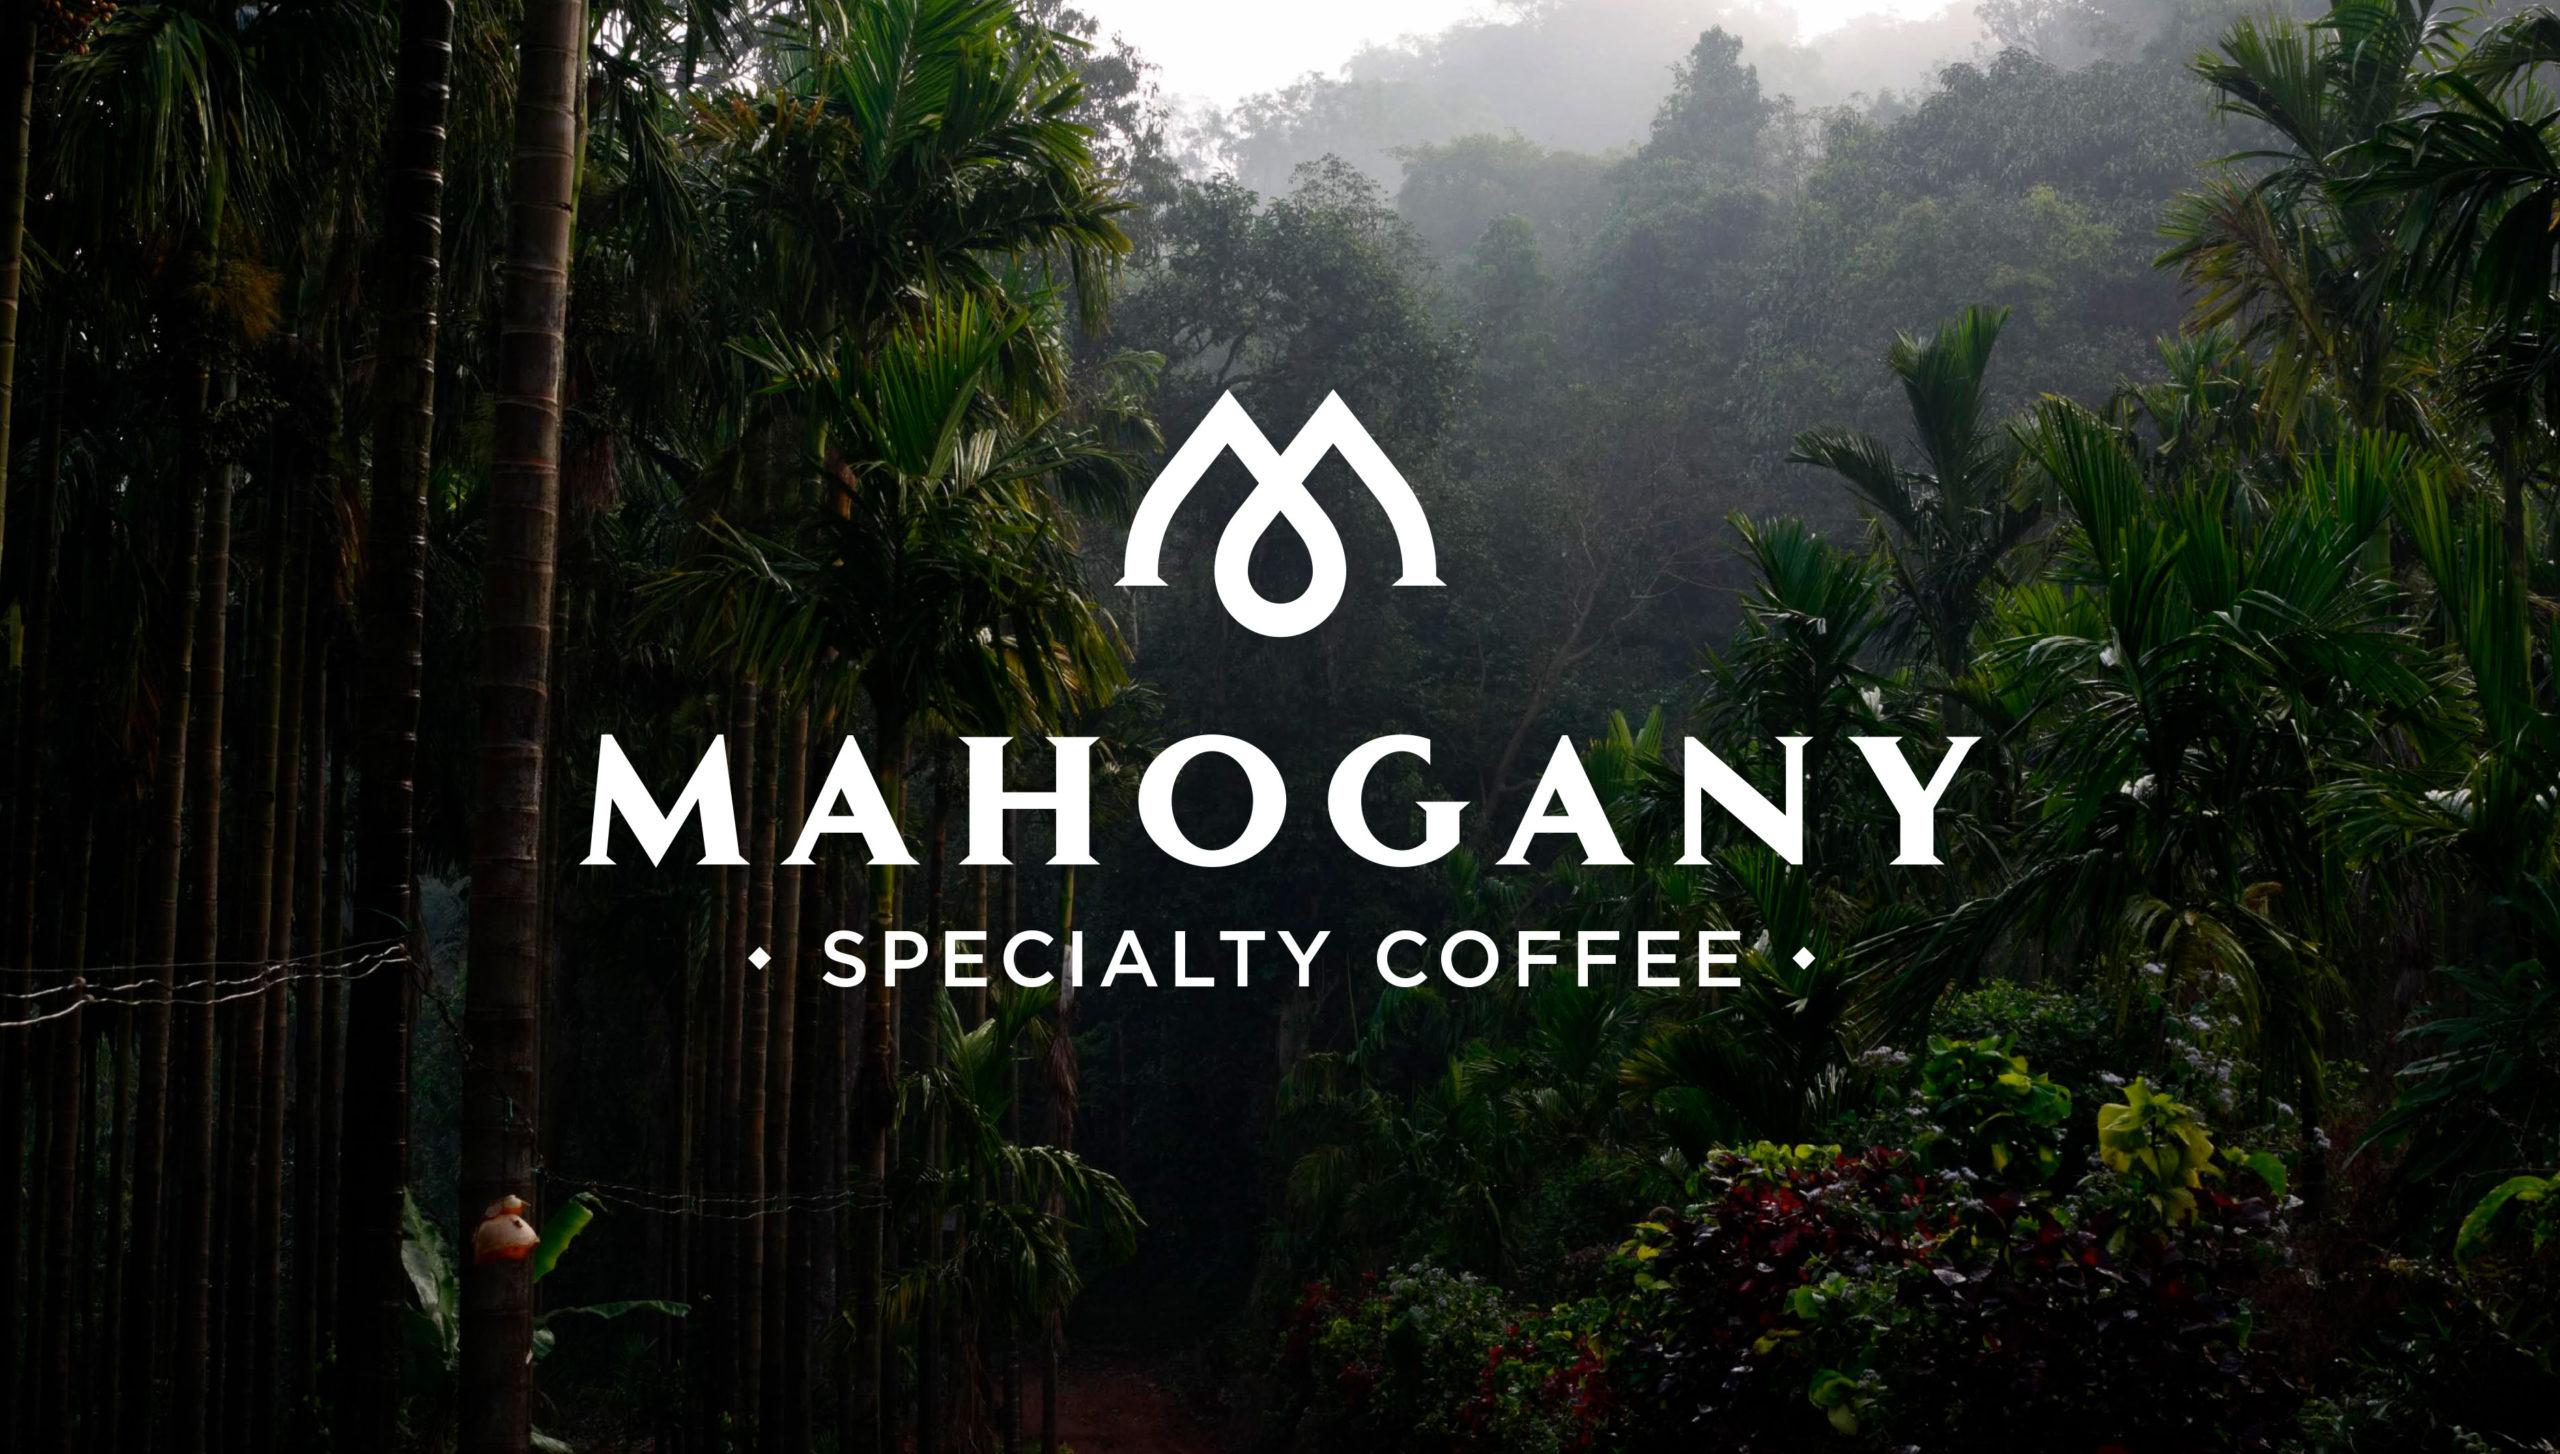 Bulldog Studio Rejuvenates Mahogany Specialty Coffee Branding